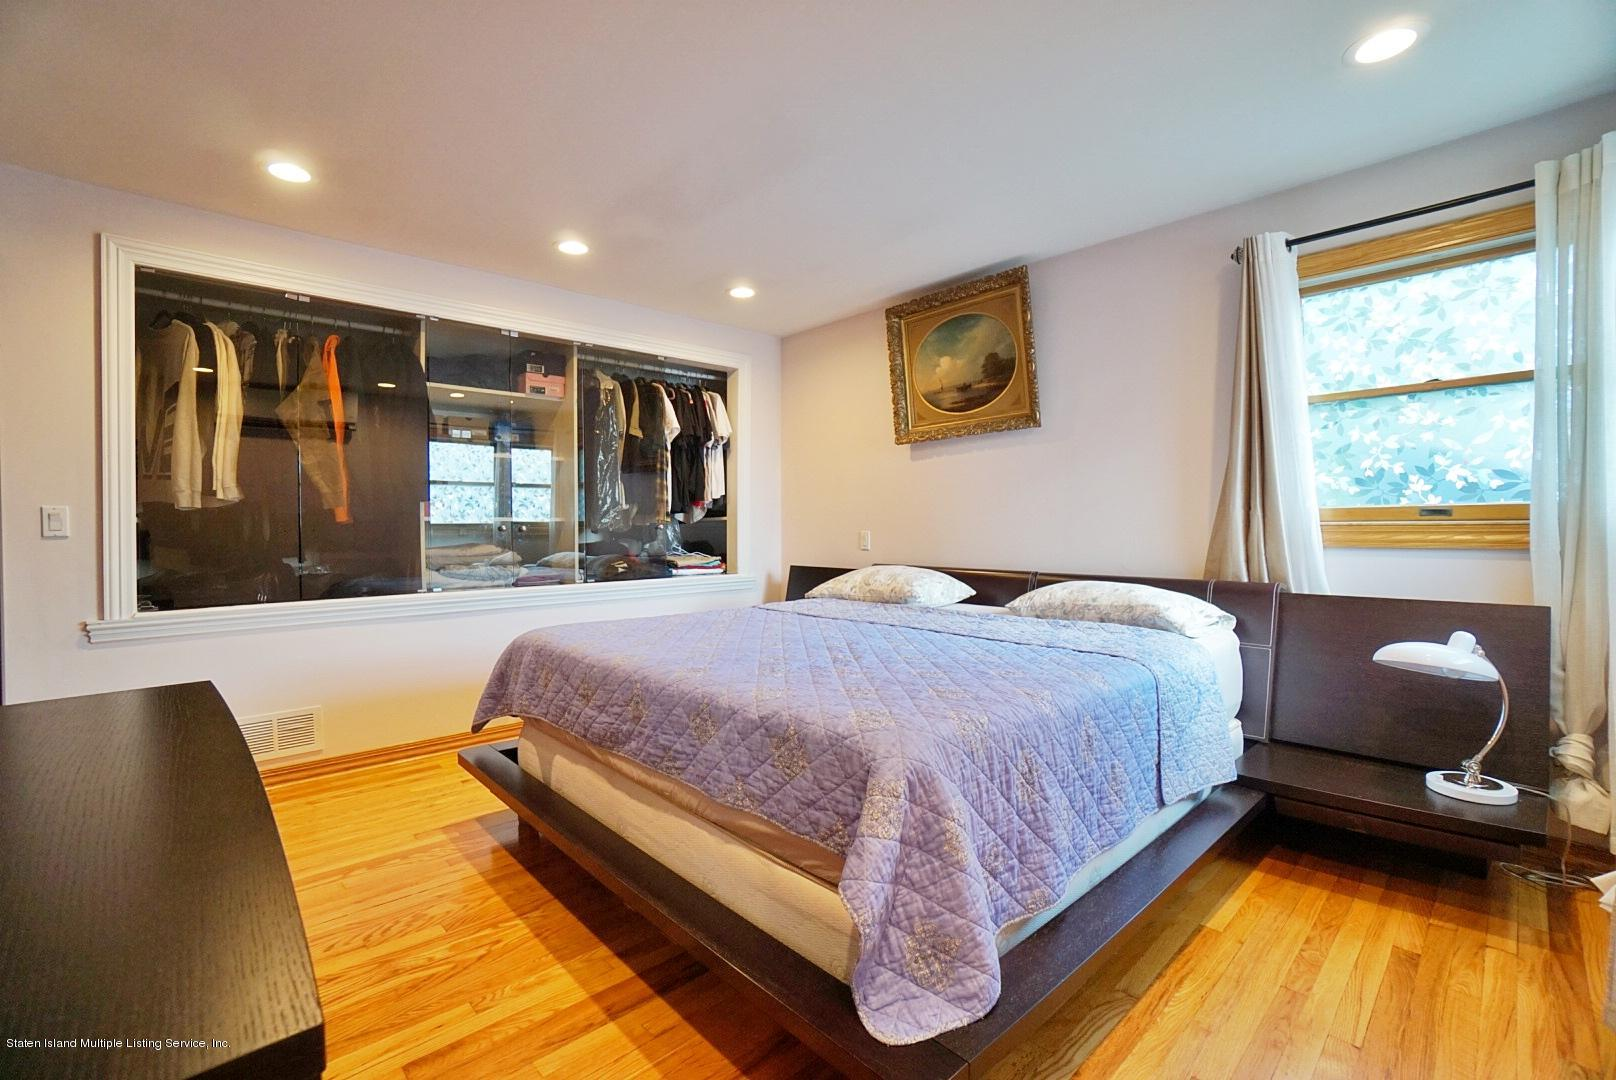 Single Family - Detached 48 Ocean Terrace  Staten Island, NY 10314, MLS-1130826-56